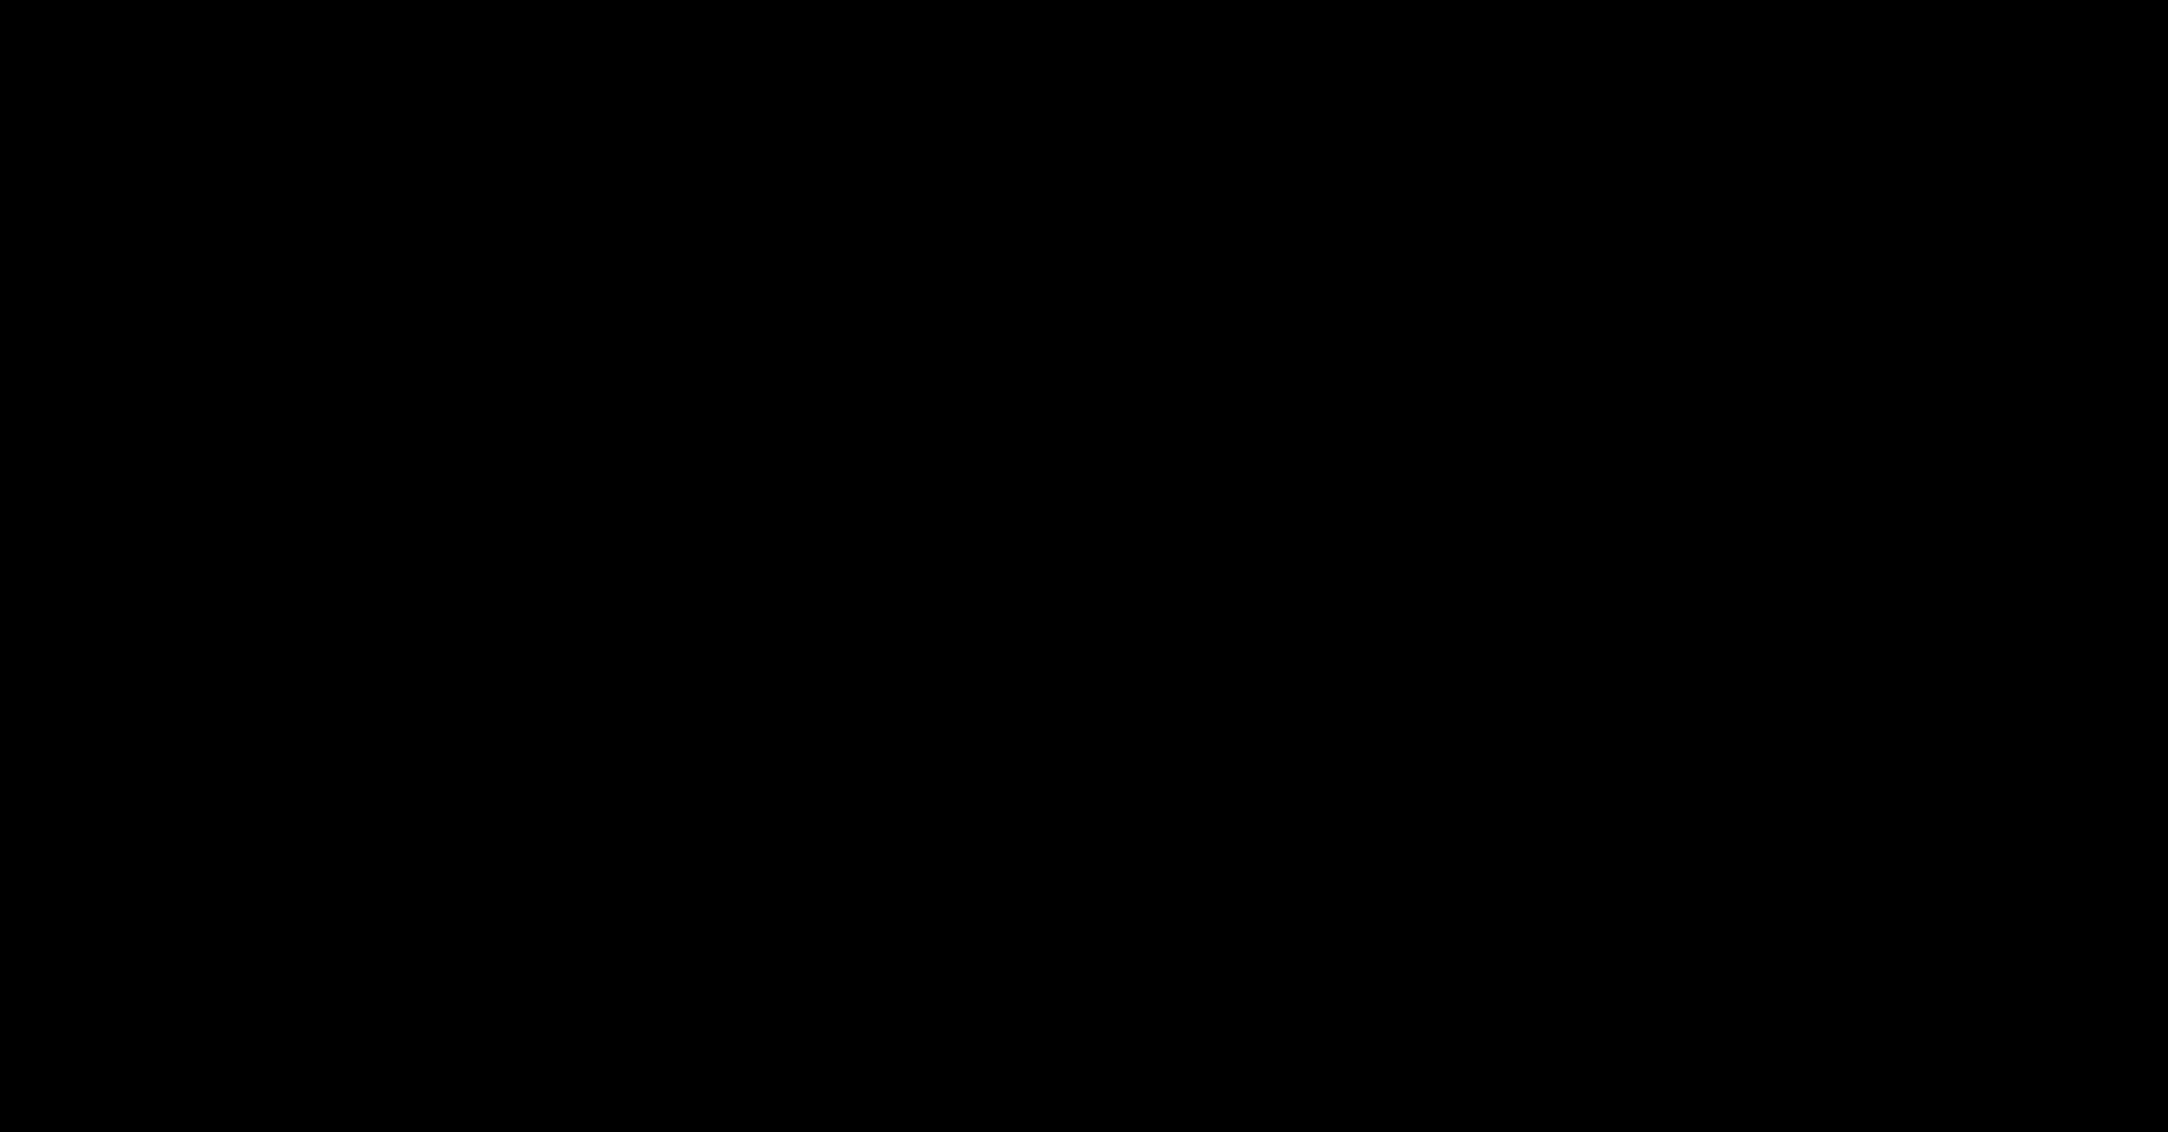 N-(4-((2-Amino-9H-purin-6-yloxy)methyl)benzyl)-3,5-bis(prop-2-ynyloxy)benzamide